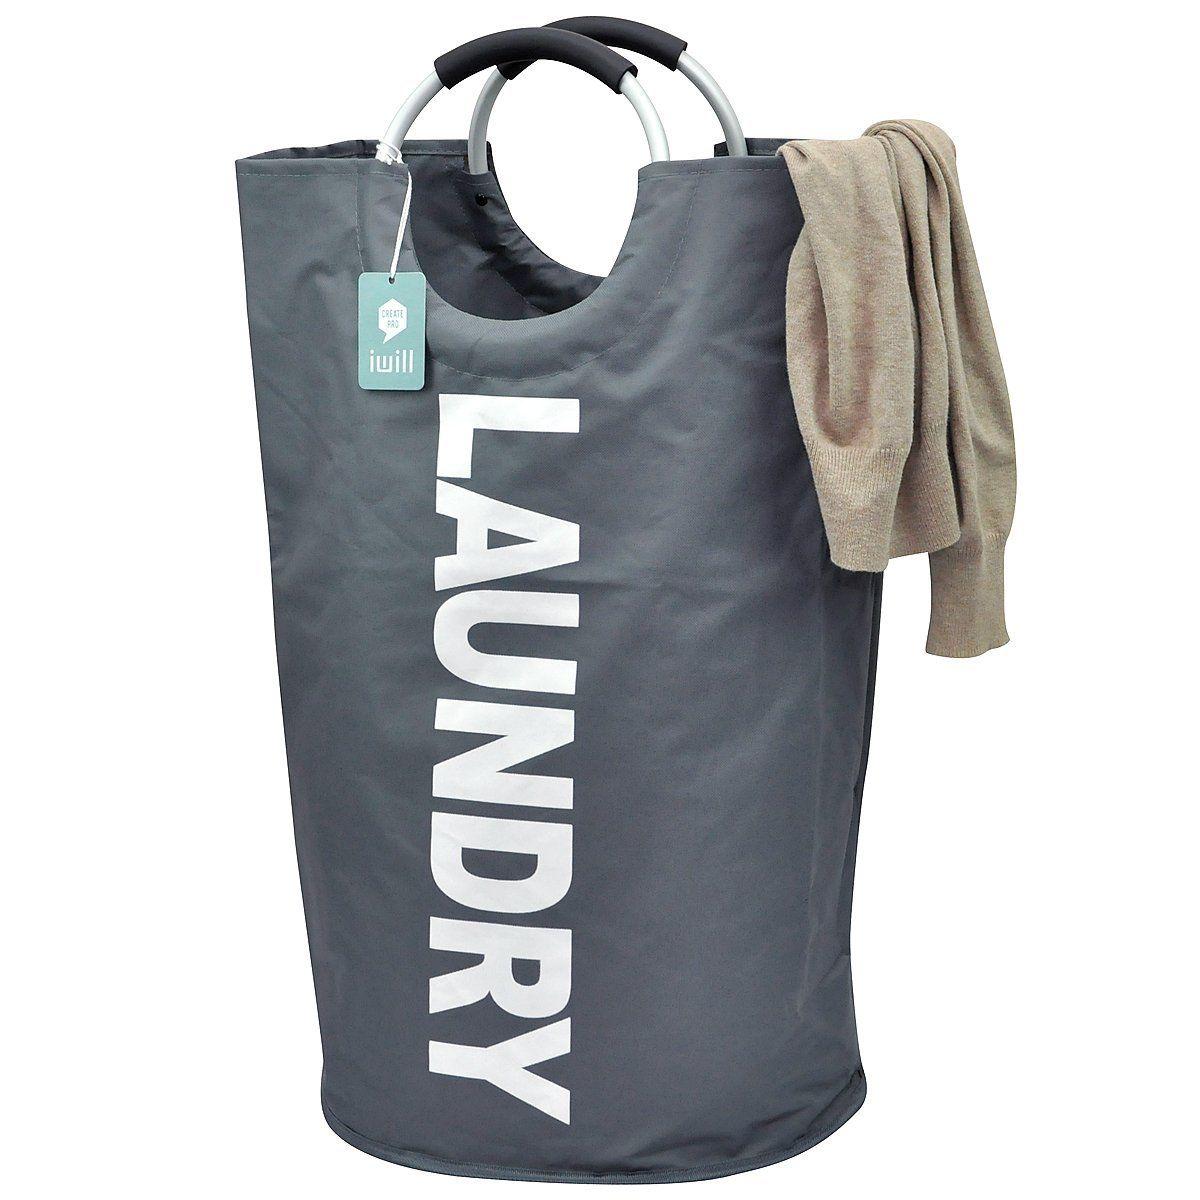 23 99 Amazon Com Foldable Heavy Duty Laundry Basket With Double